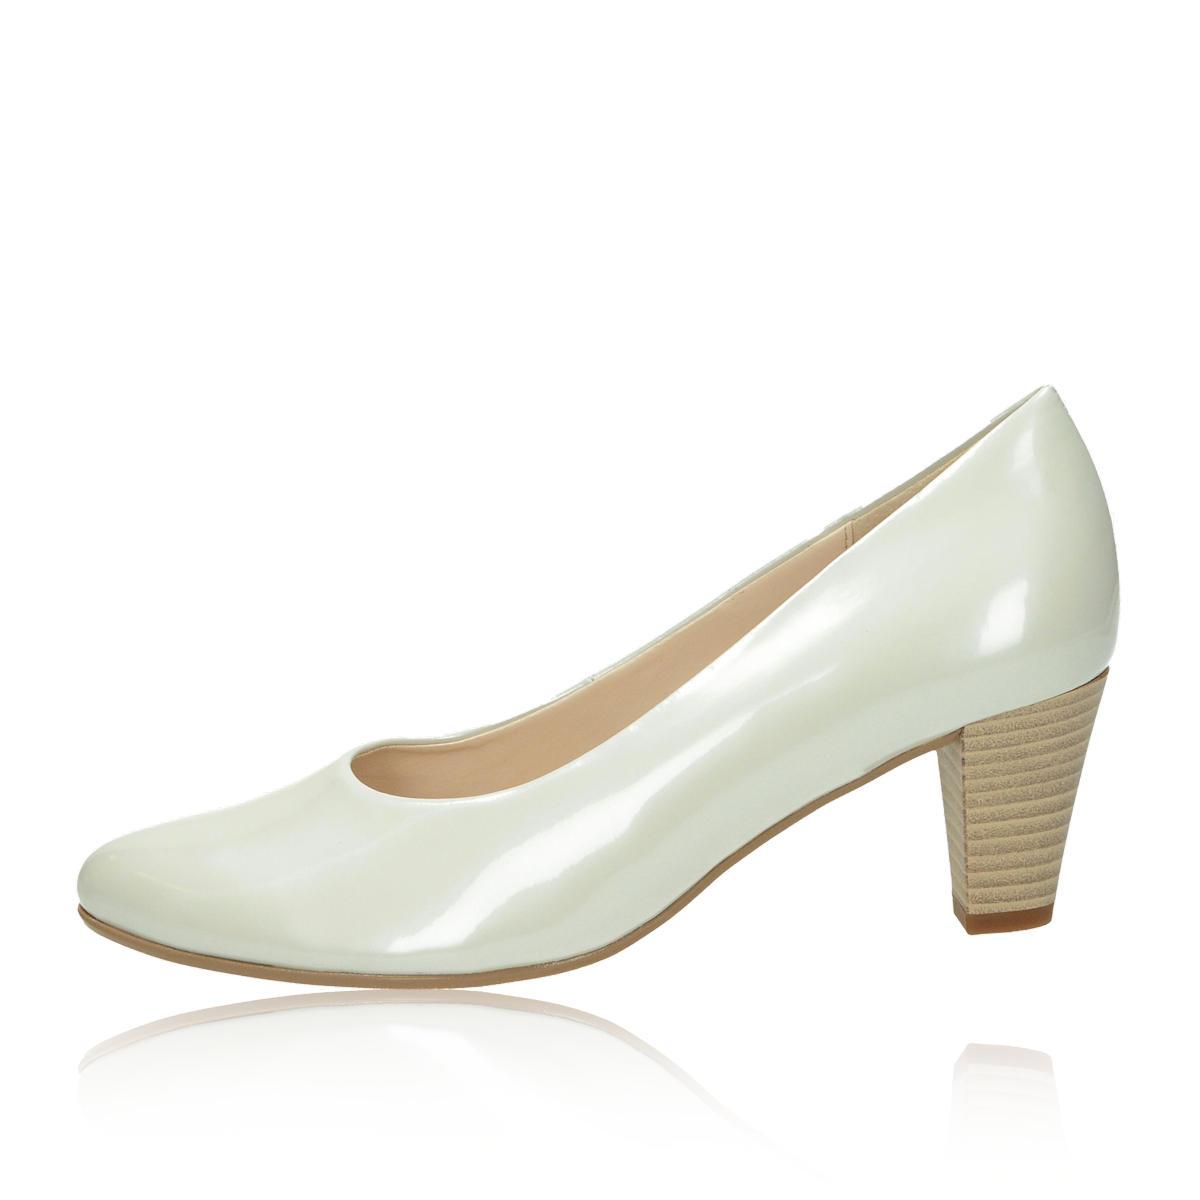 Gabor dámské lodičky - bílé Gabor dámské lodičky - bílé ... b21ca6a89c